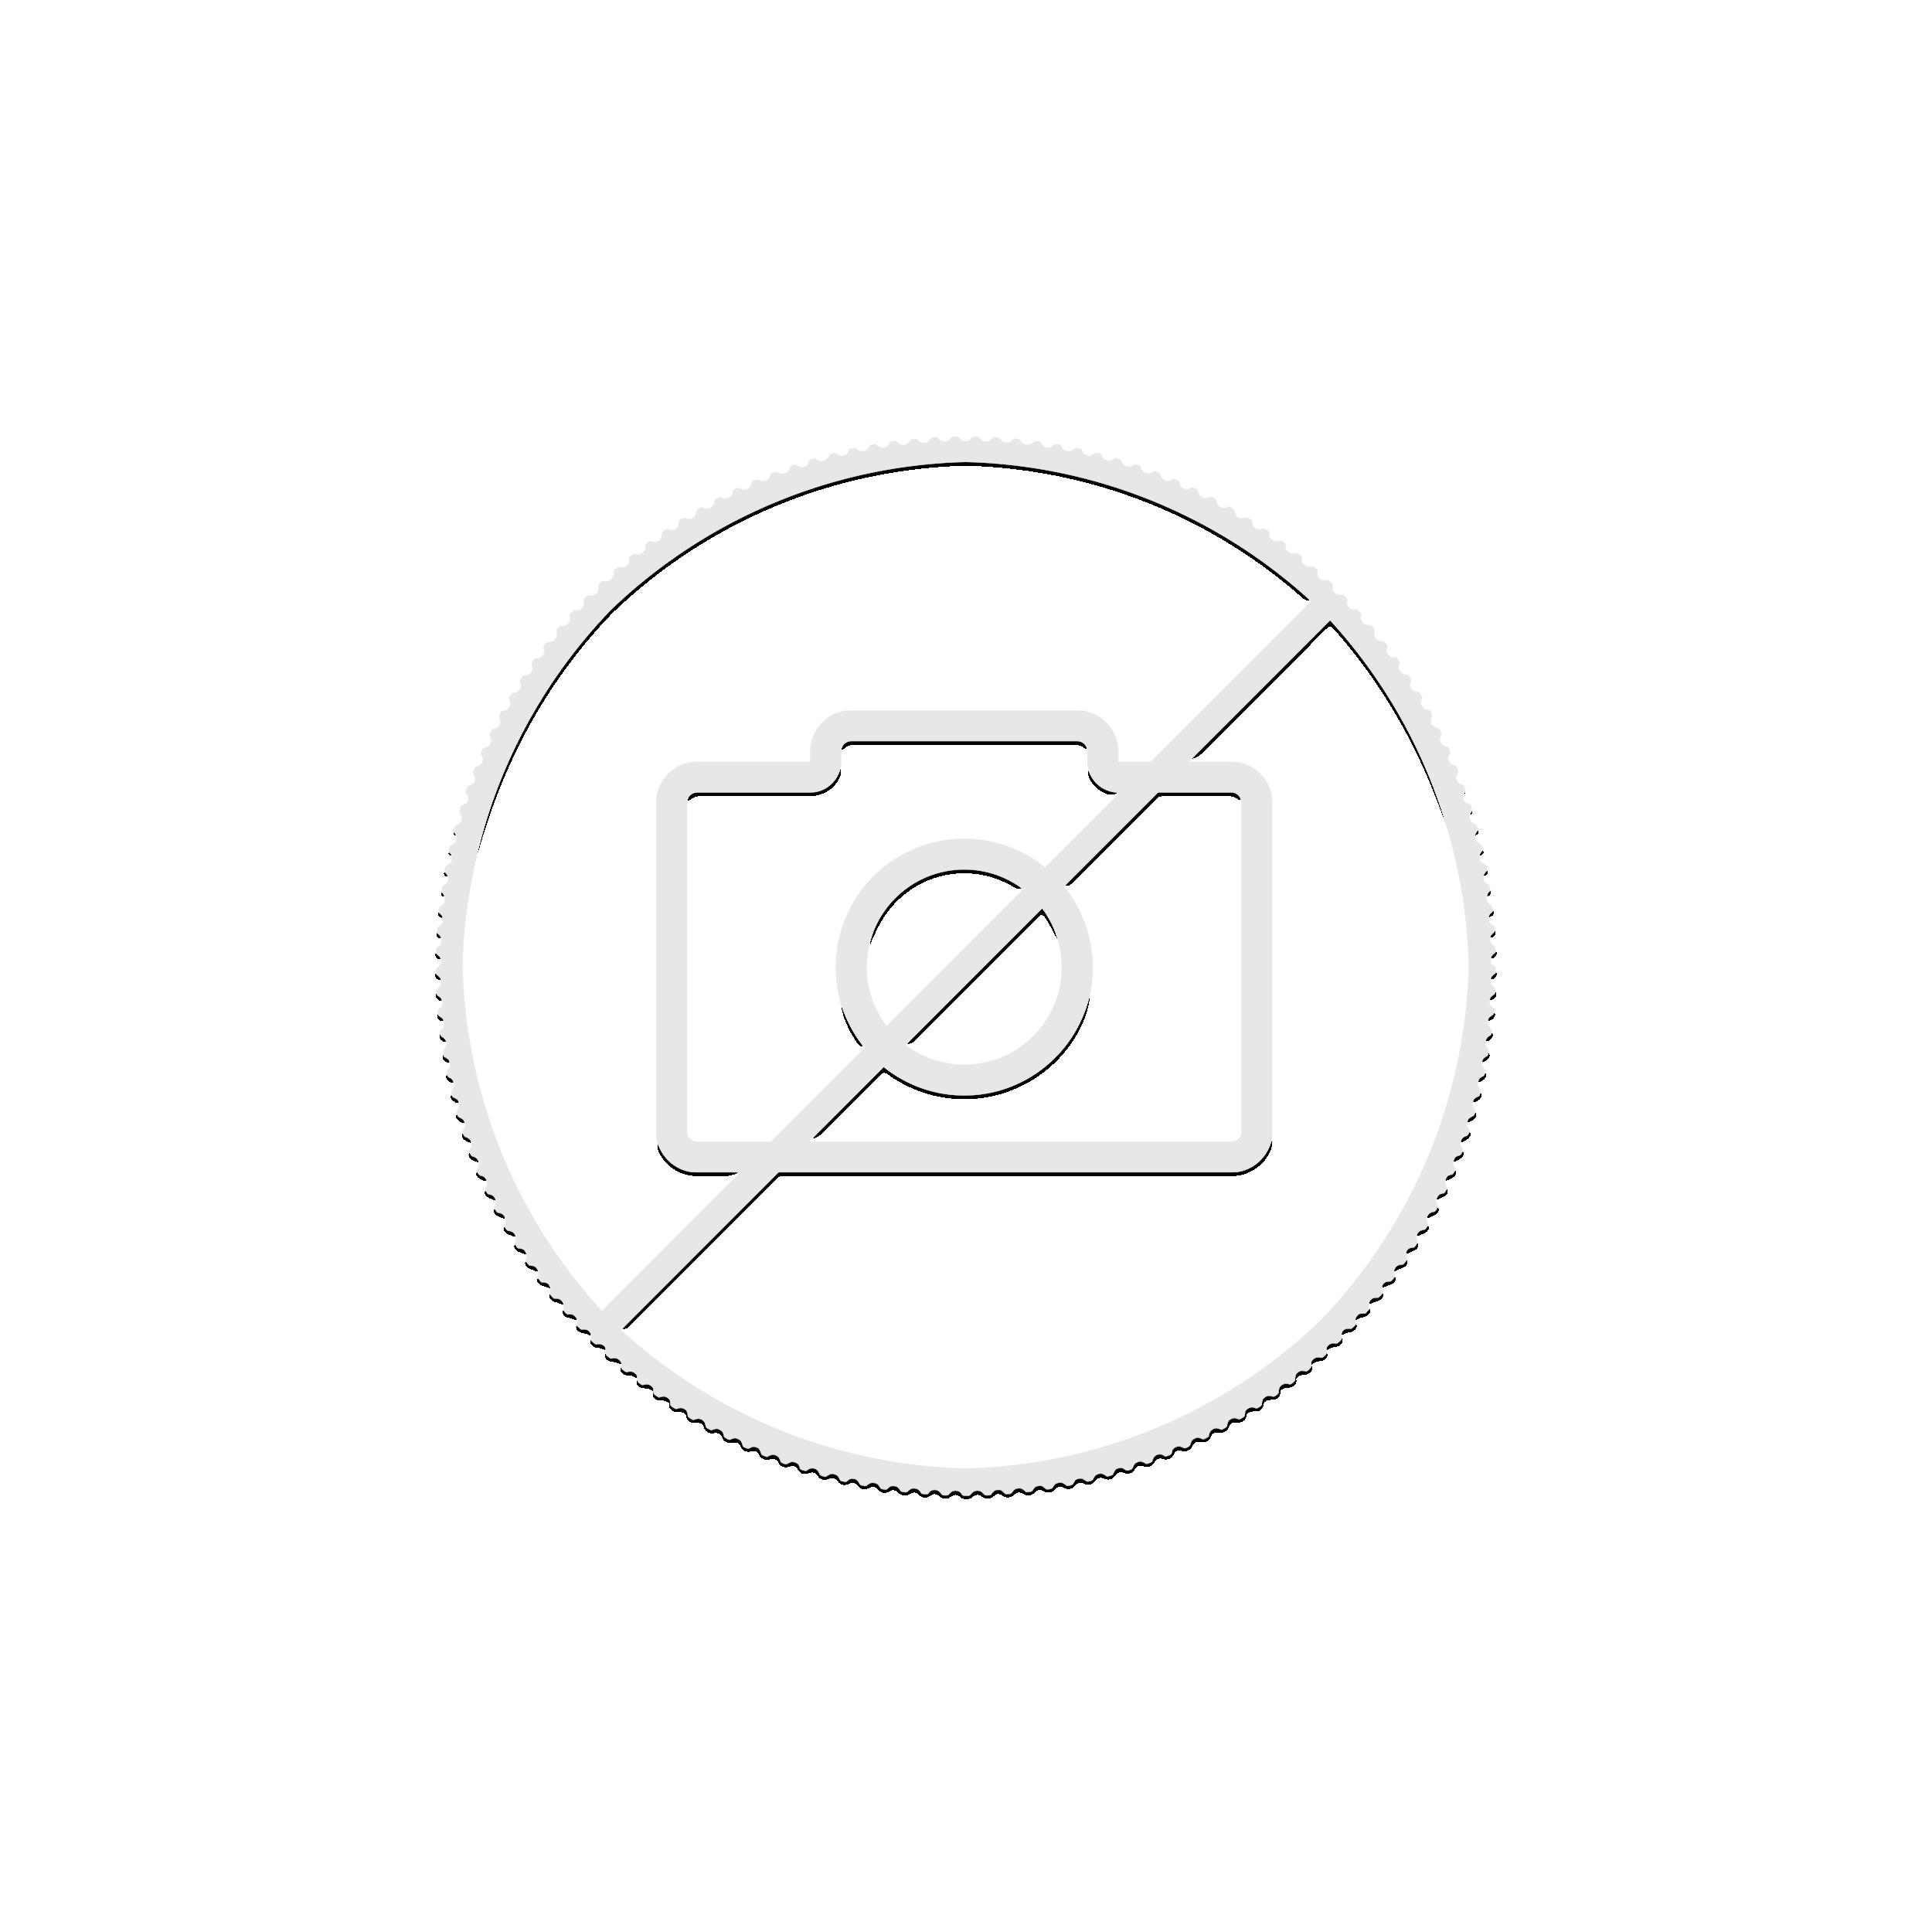 1 Kilo silver coin Kookaburra 2007